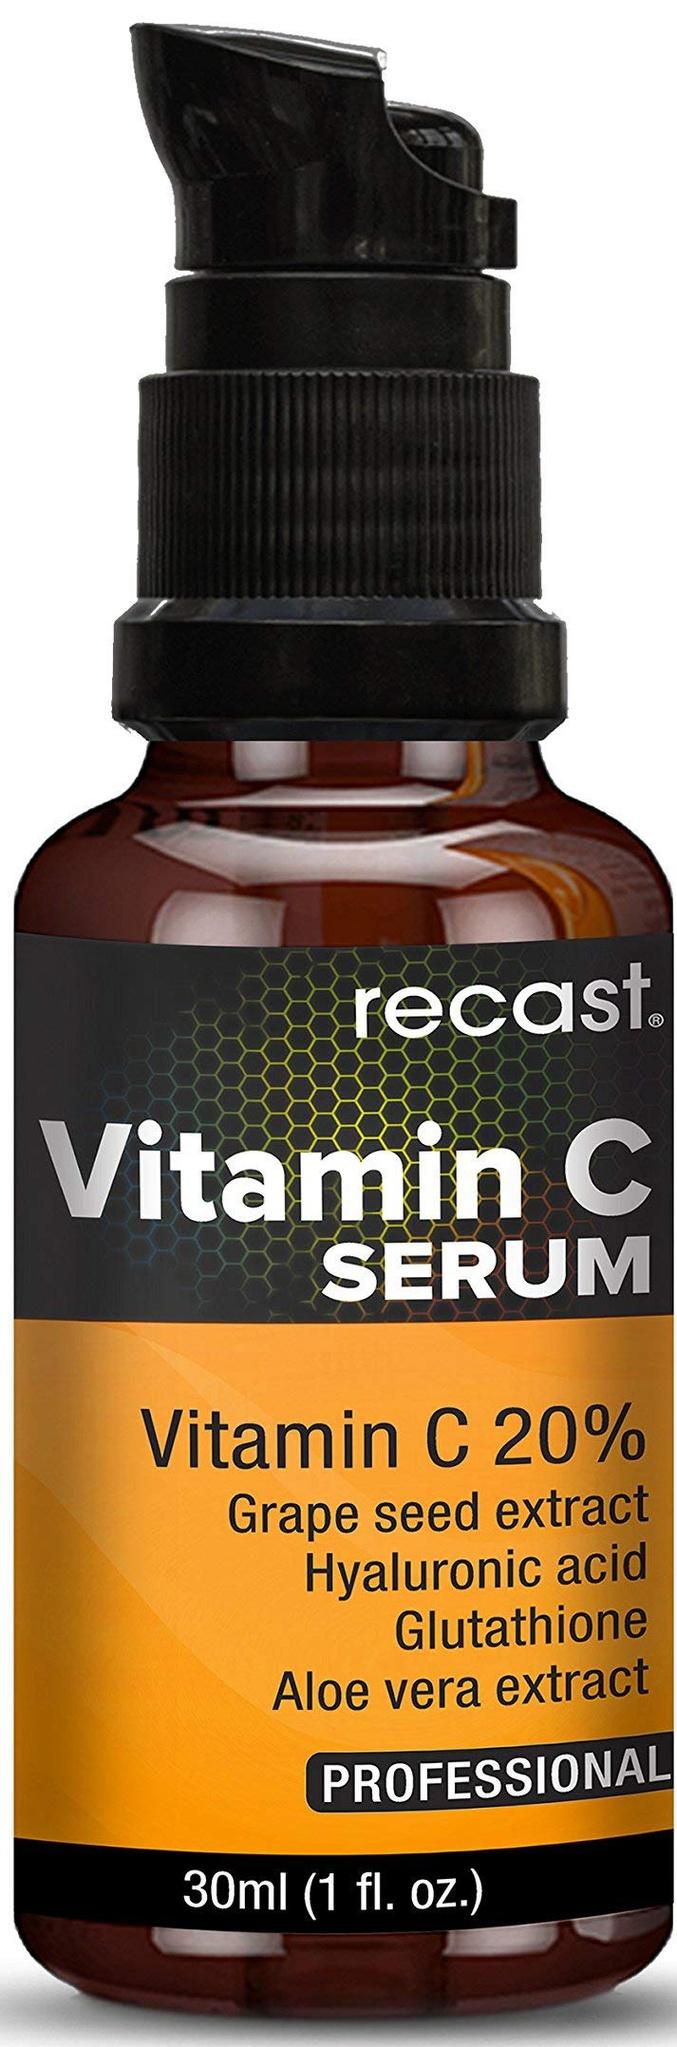 Recast Vitamin-C Face Serum With Hyaluronic Acid